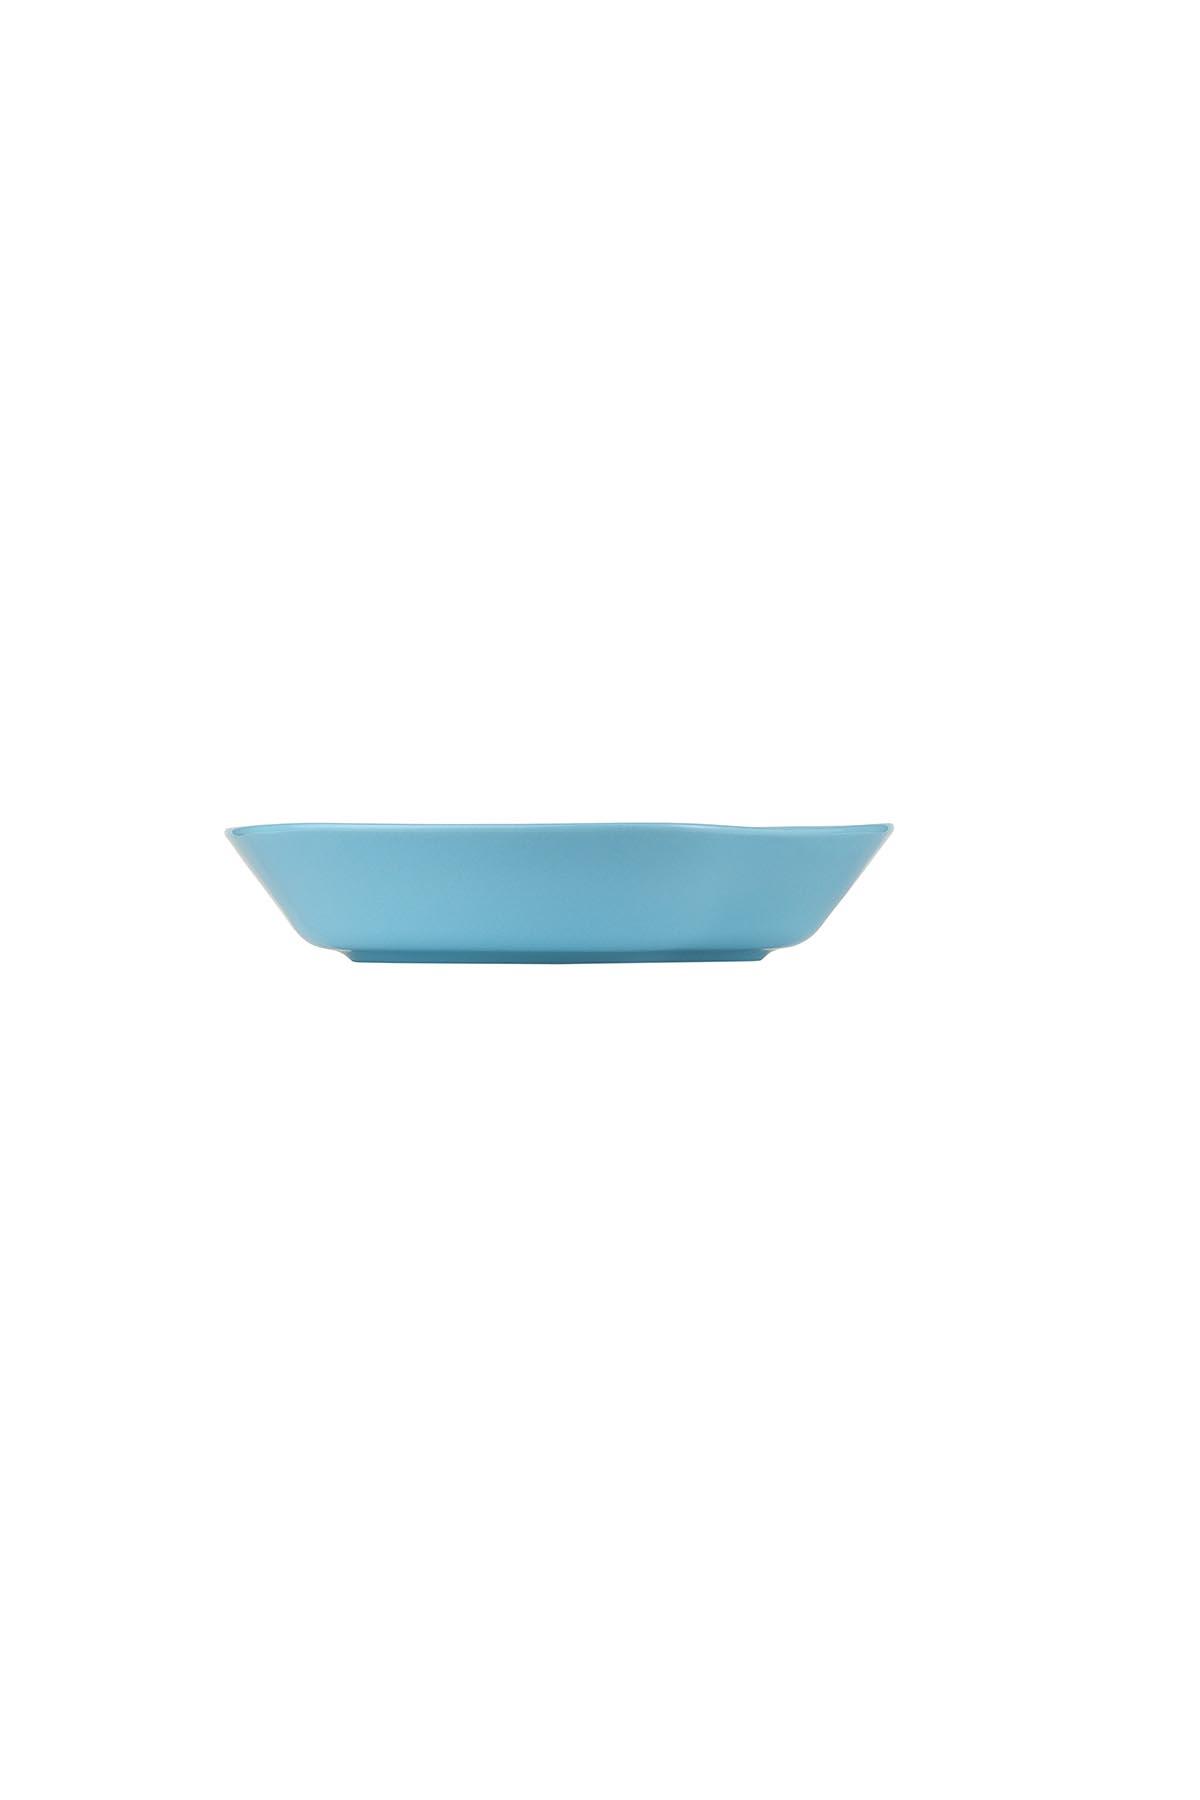 Kütahya Porselen Skallop 2'li 24 cm Çukur Tabak Seti Seti Turkuaz